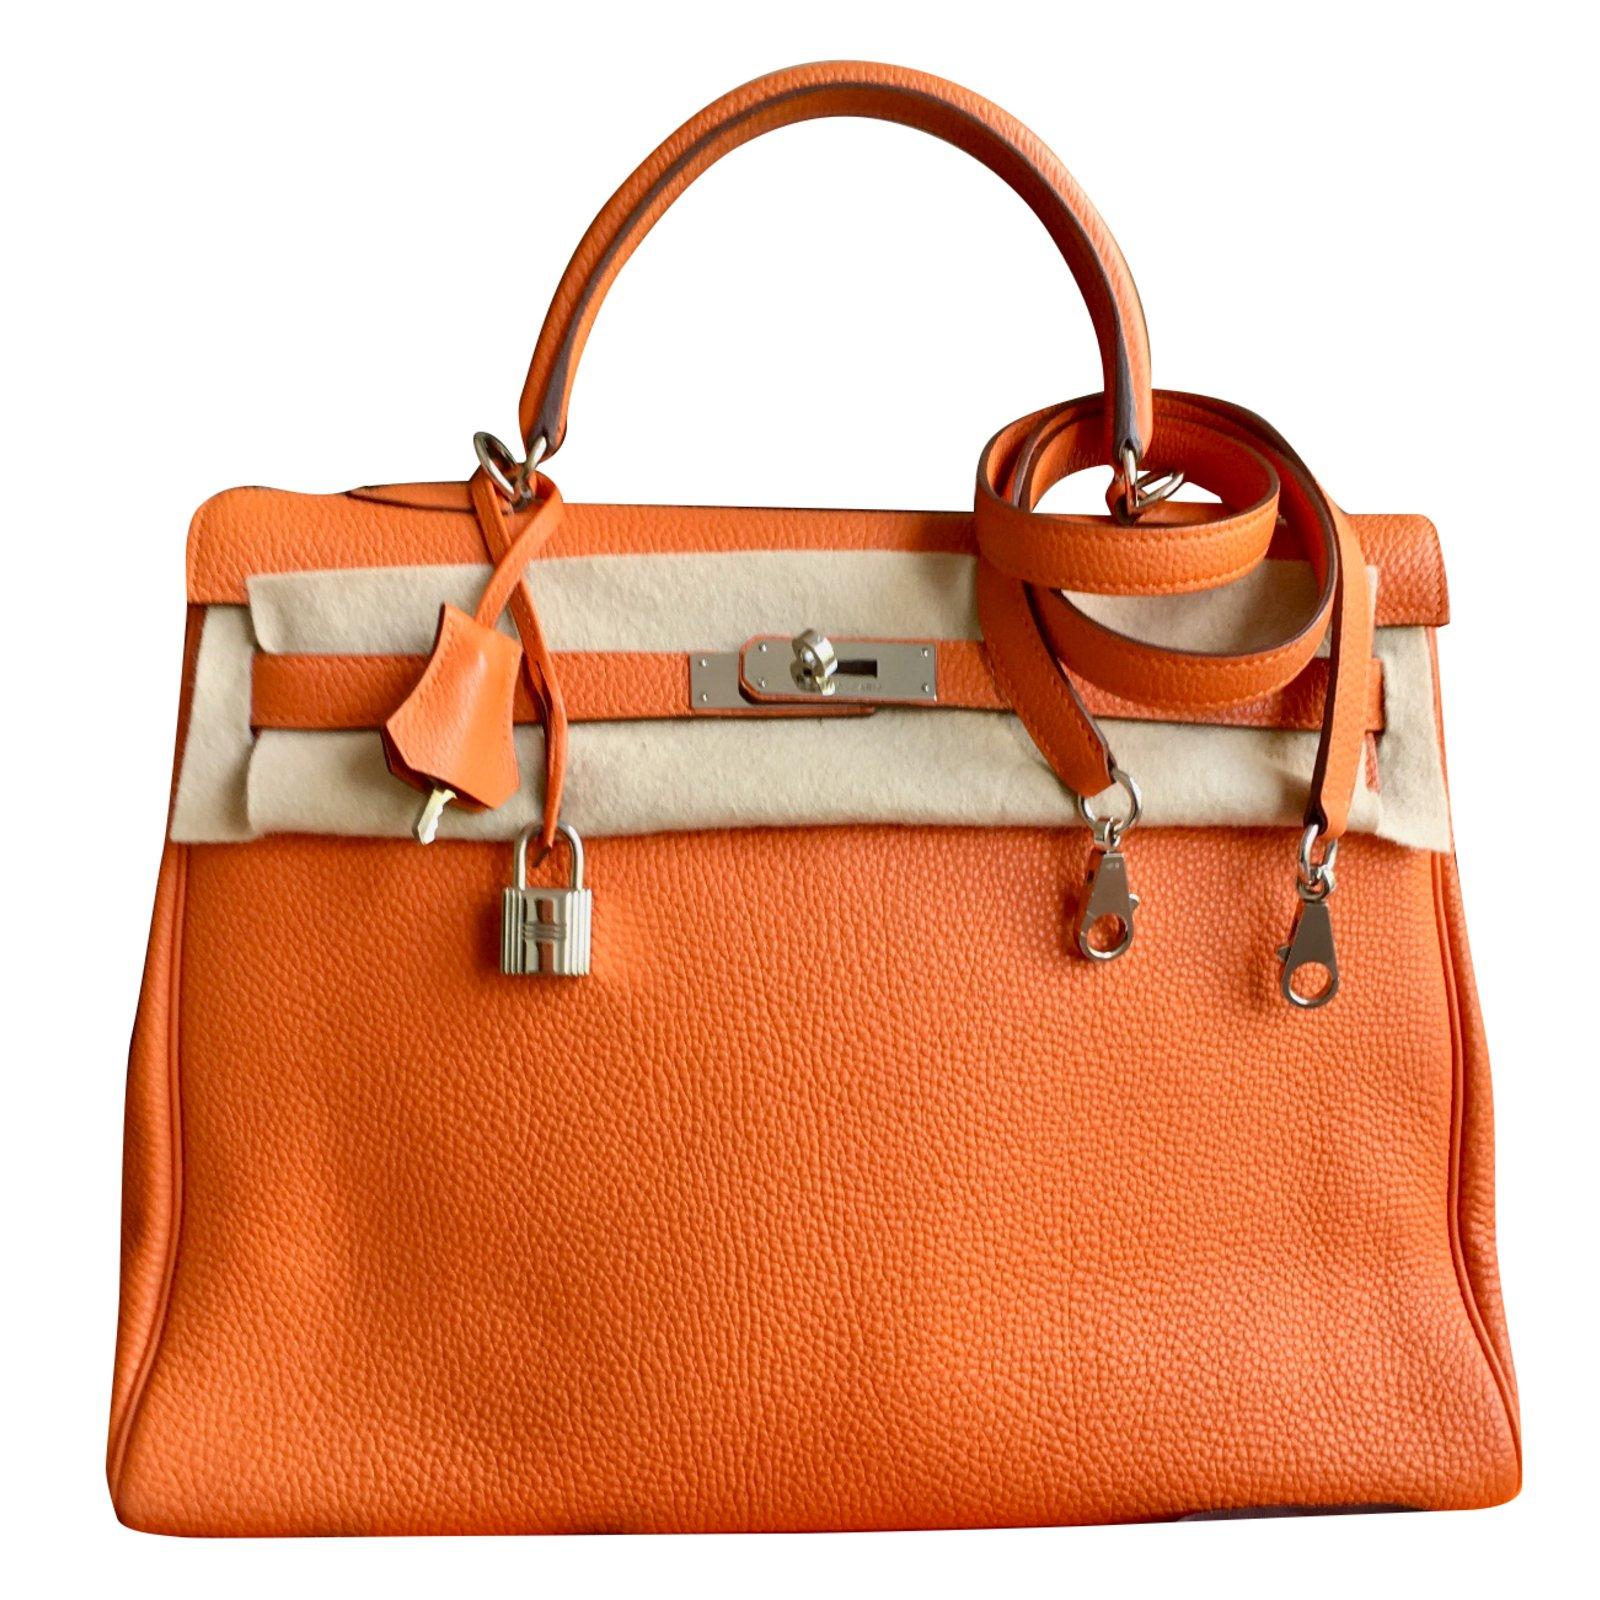 887da5e81476 ... noir cuir exotique 47fc5 06c93 greece hermès kelly 35 cm handbags  leather orange ref.41525 834f1 0861e promo code sac kelly hermes ...